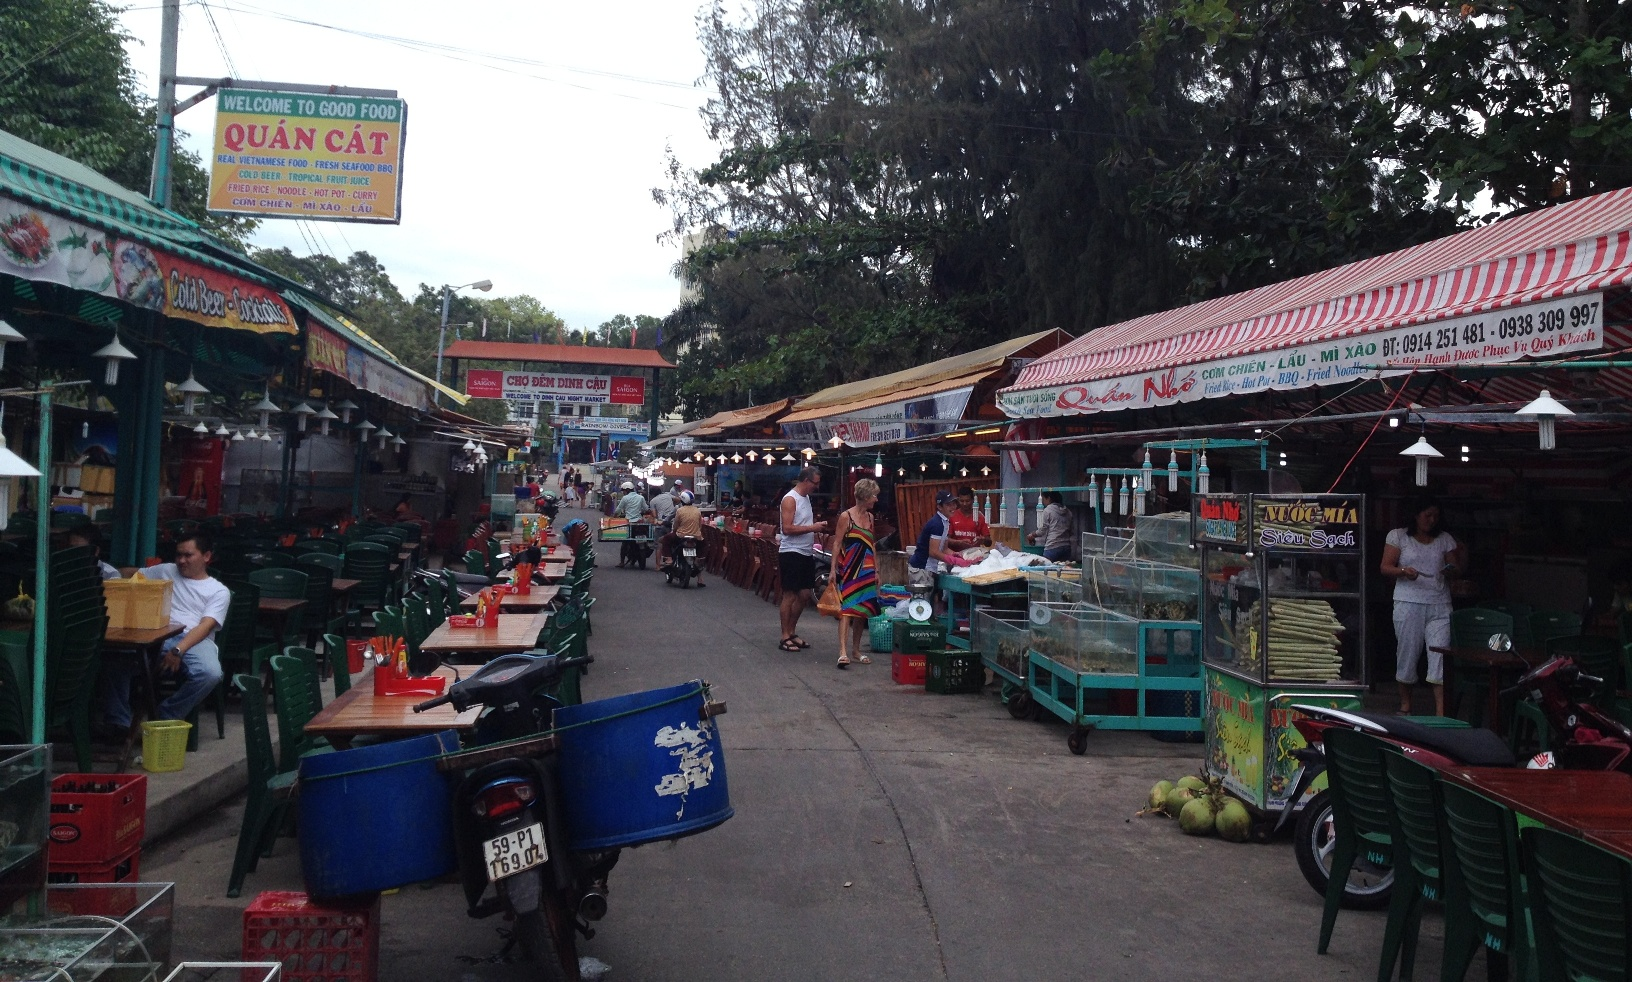 Duong-Dong-Pu-Quoc-Vietnam-Travelgrip- (4)